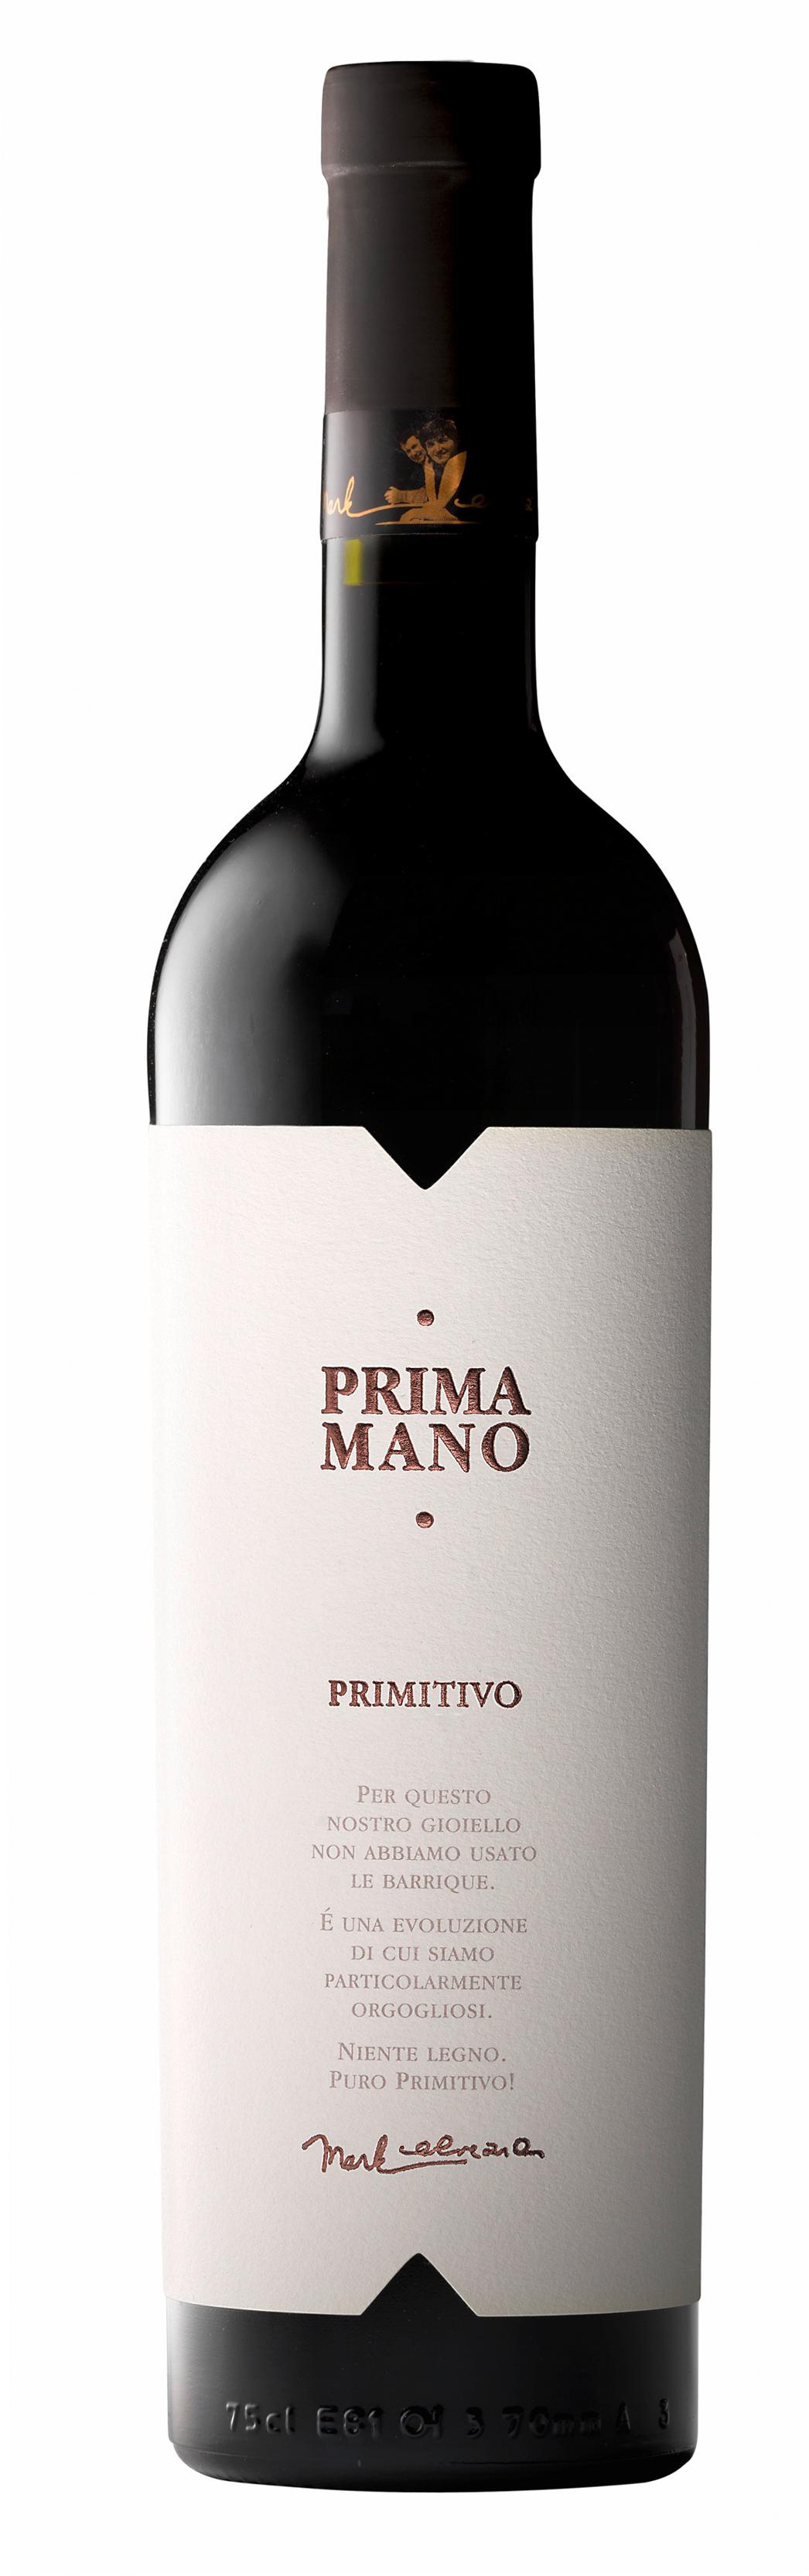 A Mano, `Prima Mano` Primitivo (Wooden Case) 2015